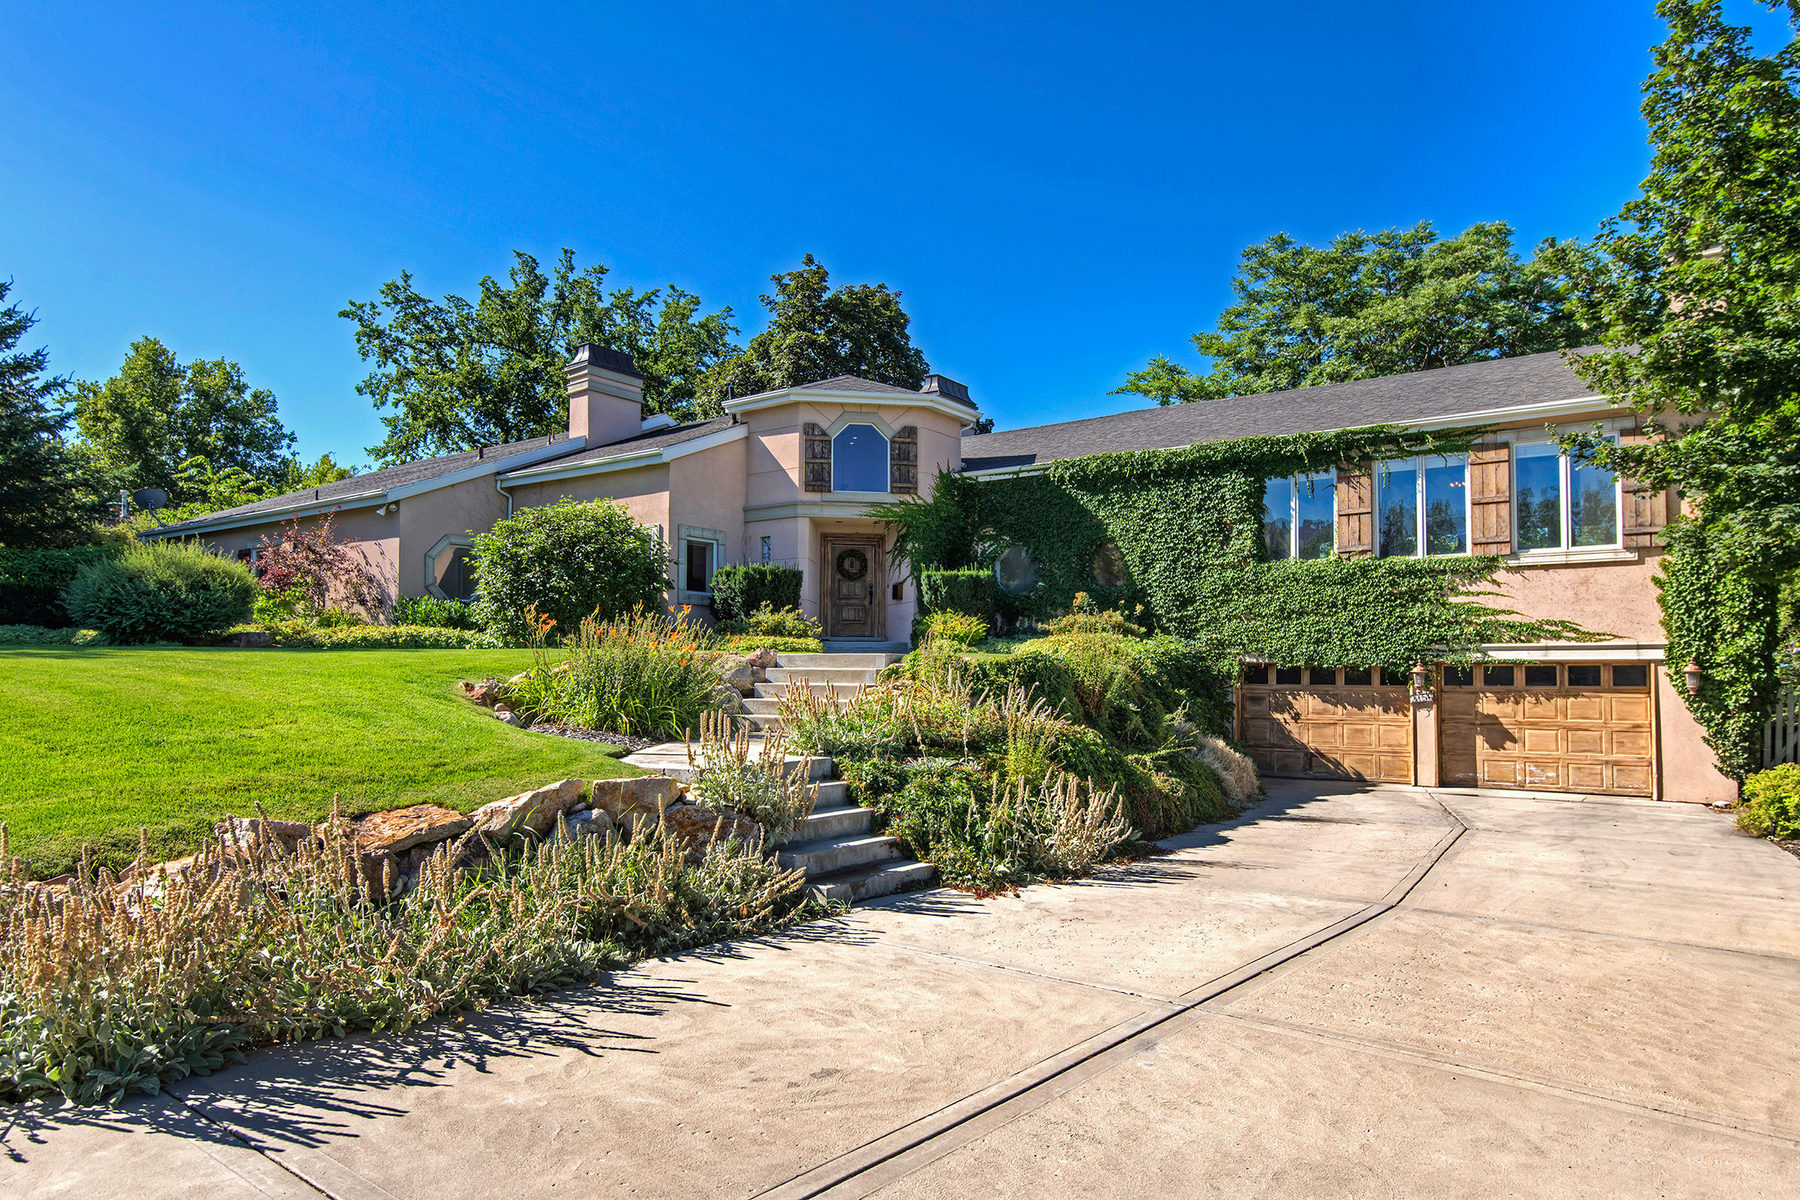 Moradia para Venda às Elegant Country Club Estate 2156 Parleys Terr Salt Lake City, Utah 84109 Estados Unidos